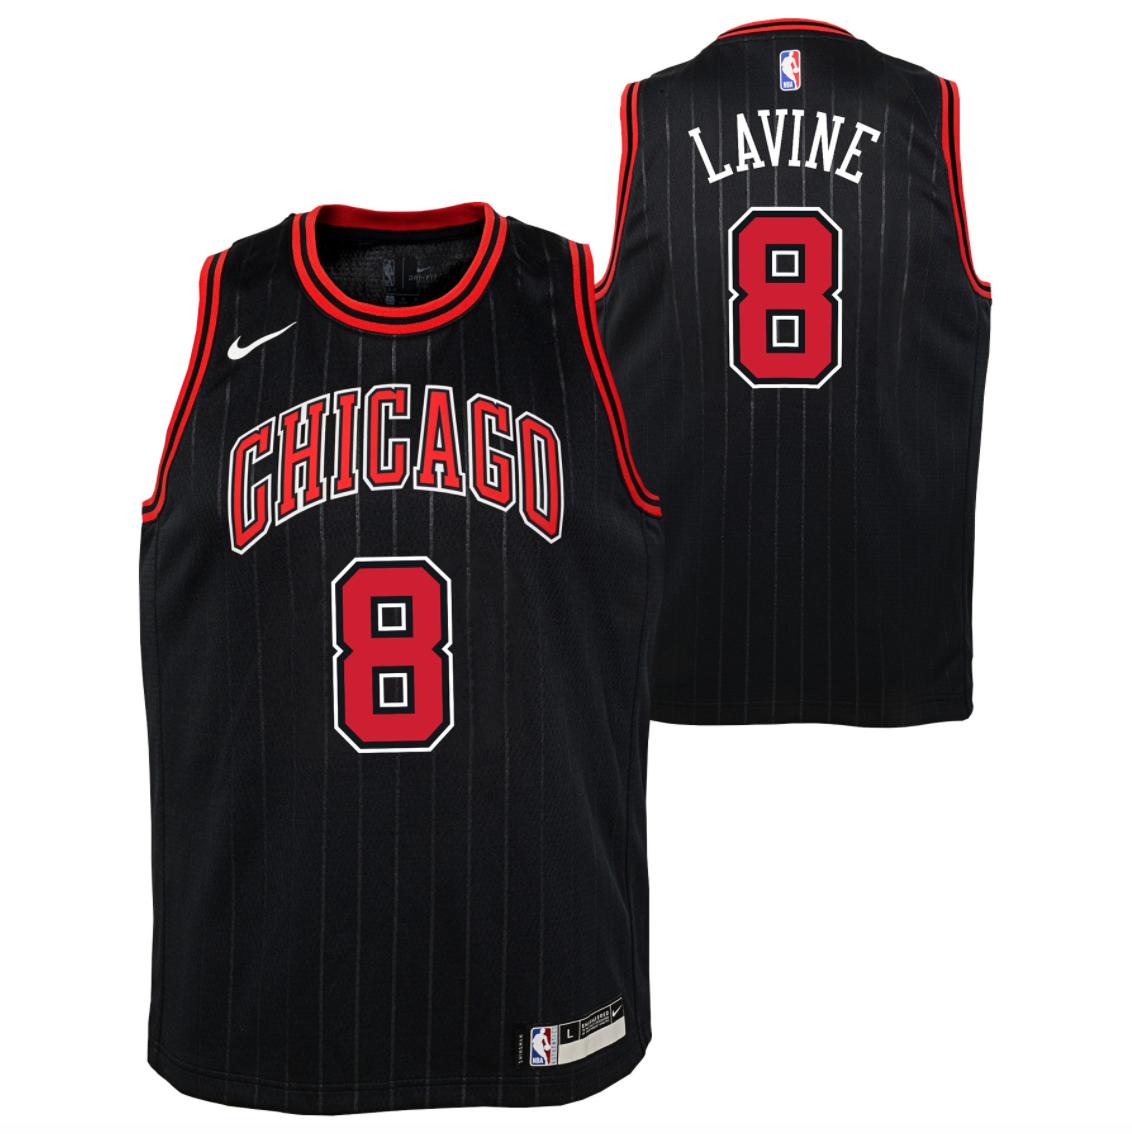 wholesale sports jerseys Nike Zach Lavine Chicago Bulls Statement ...